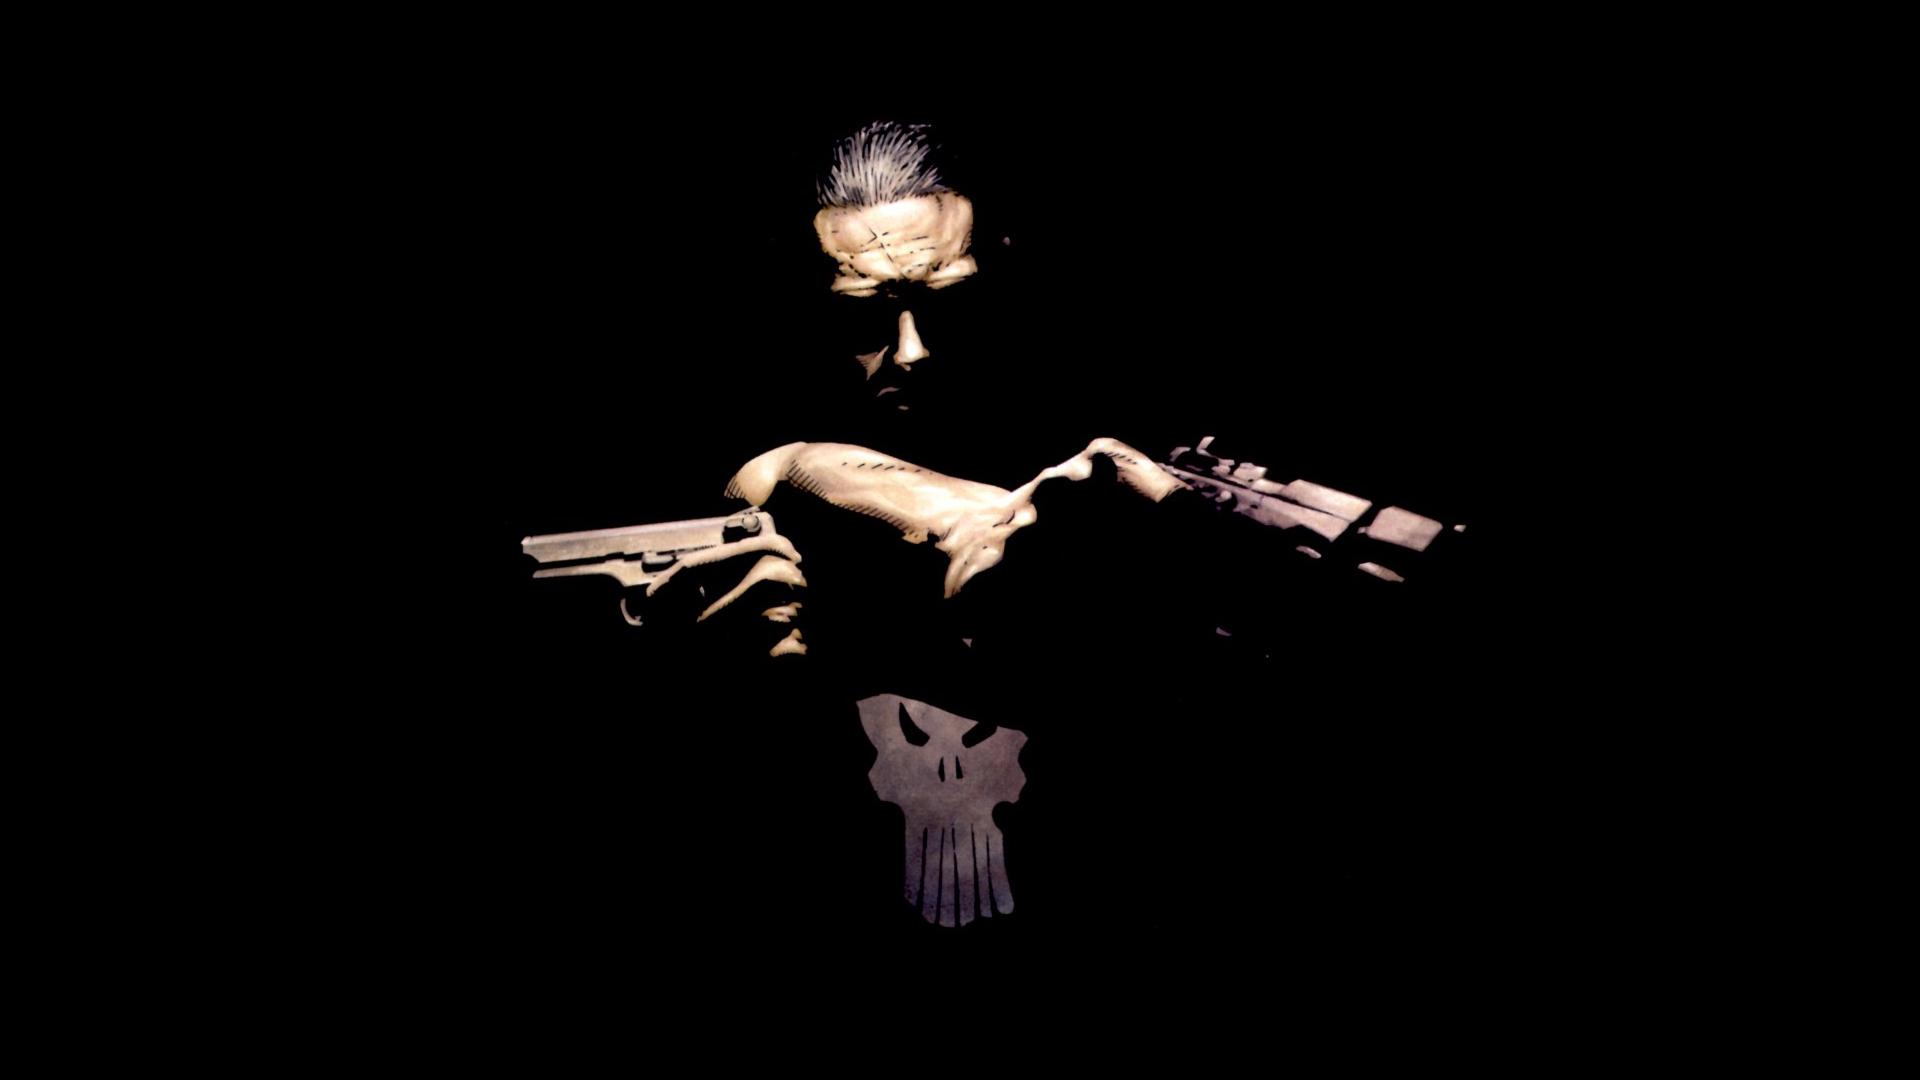 Punisher Logo Wallpaper Iphone 5 The punisher w…